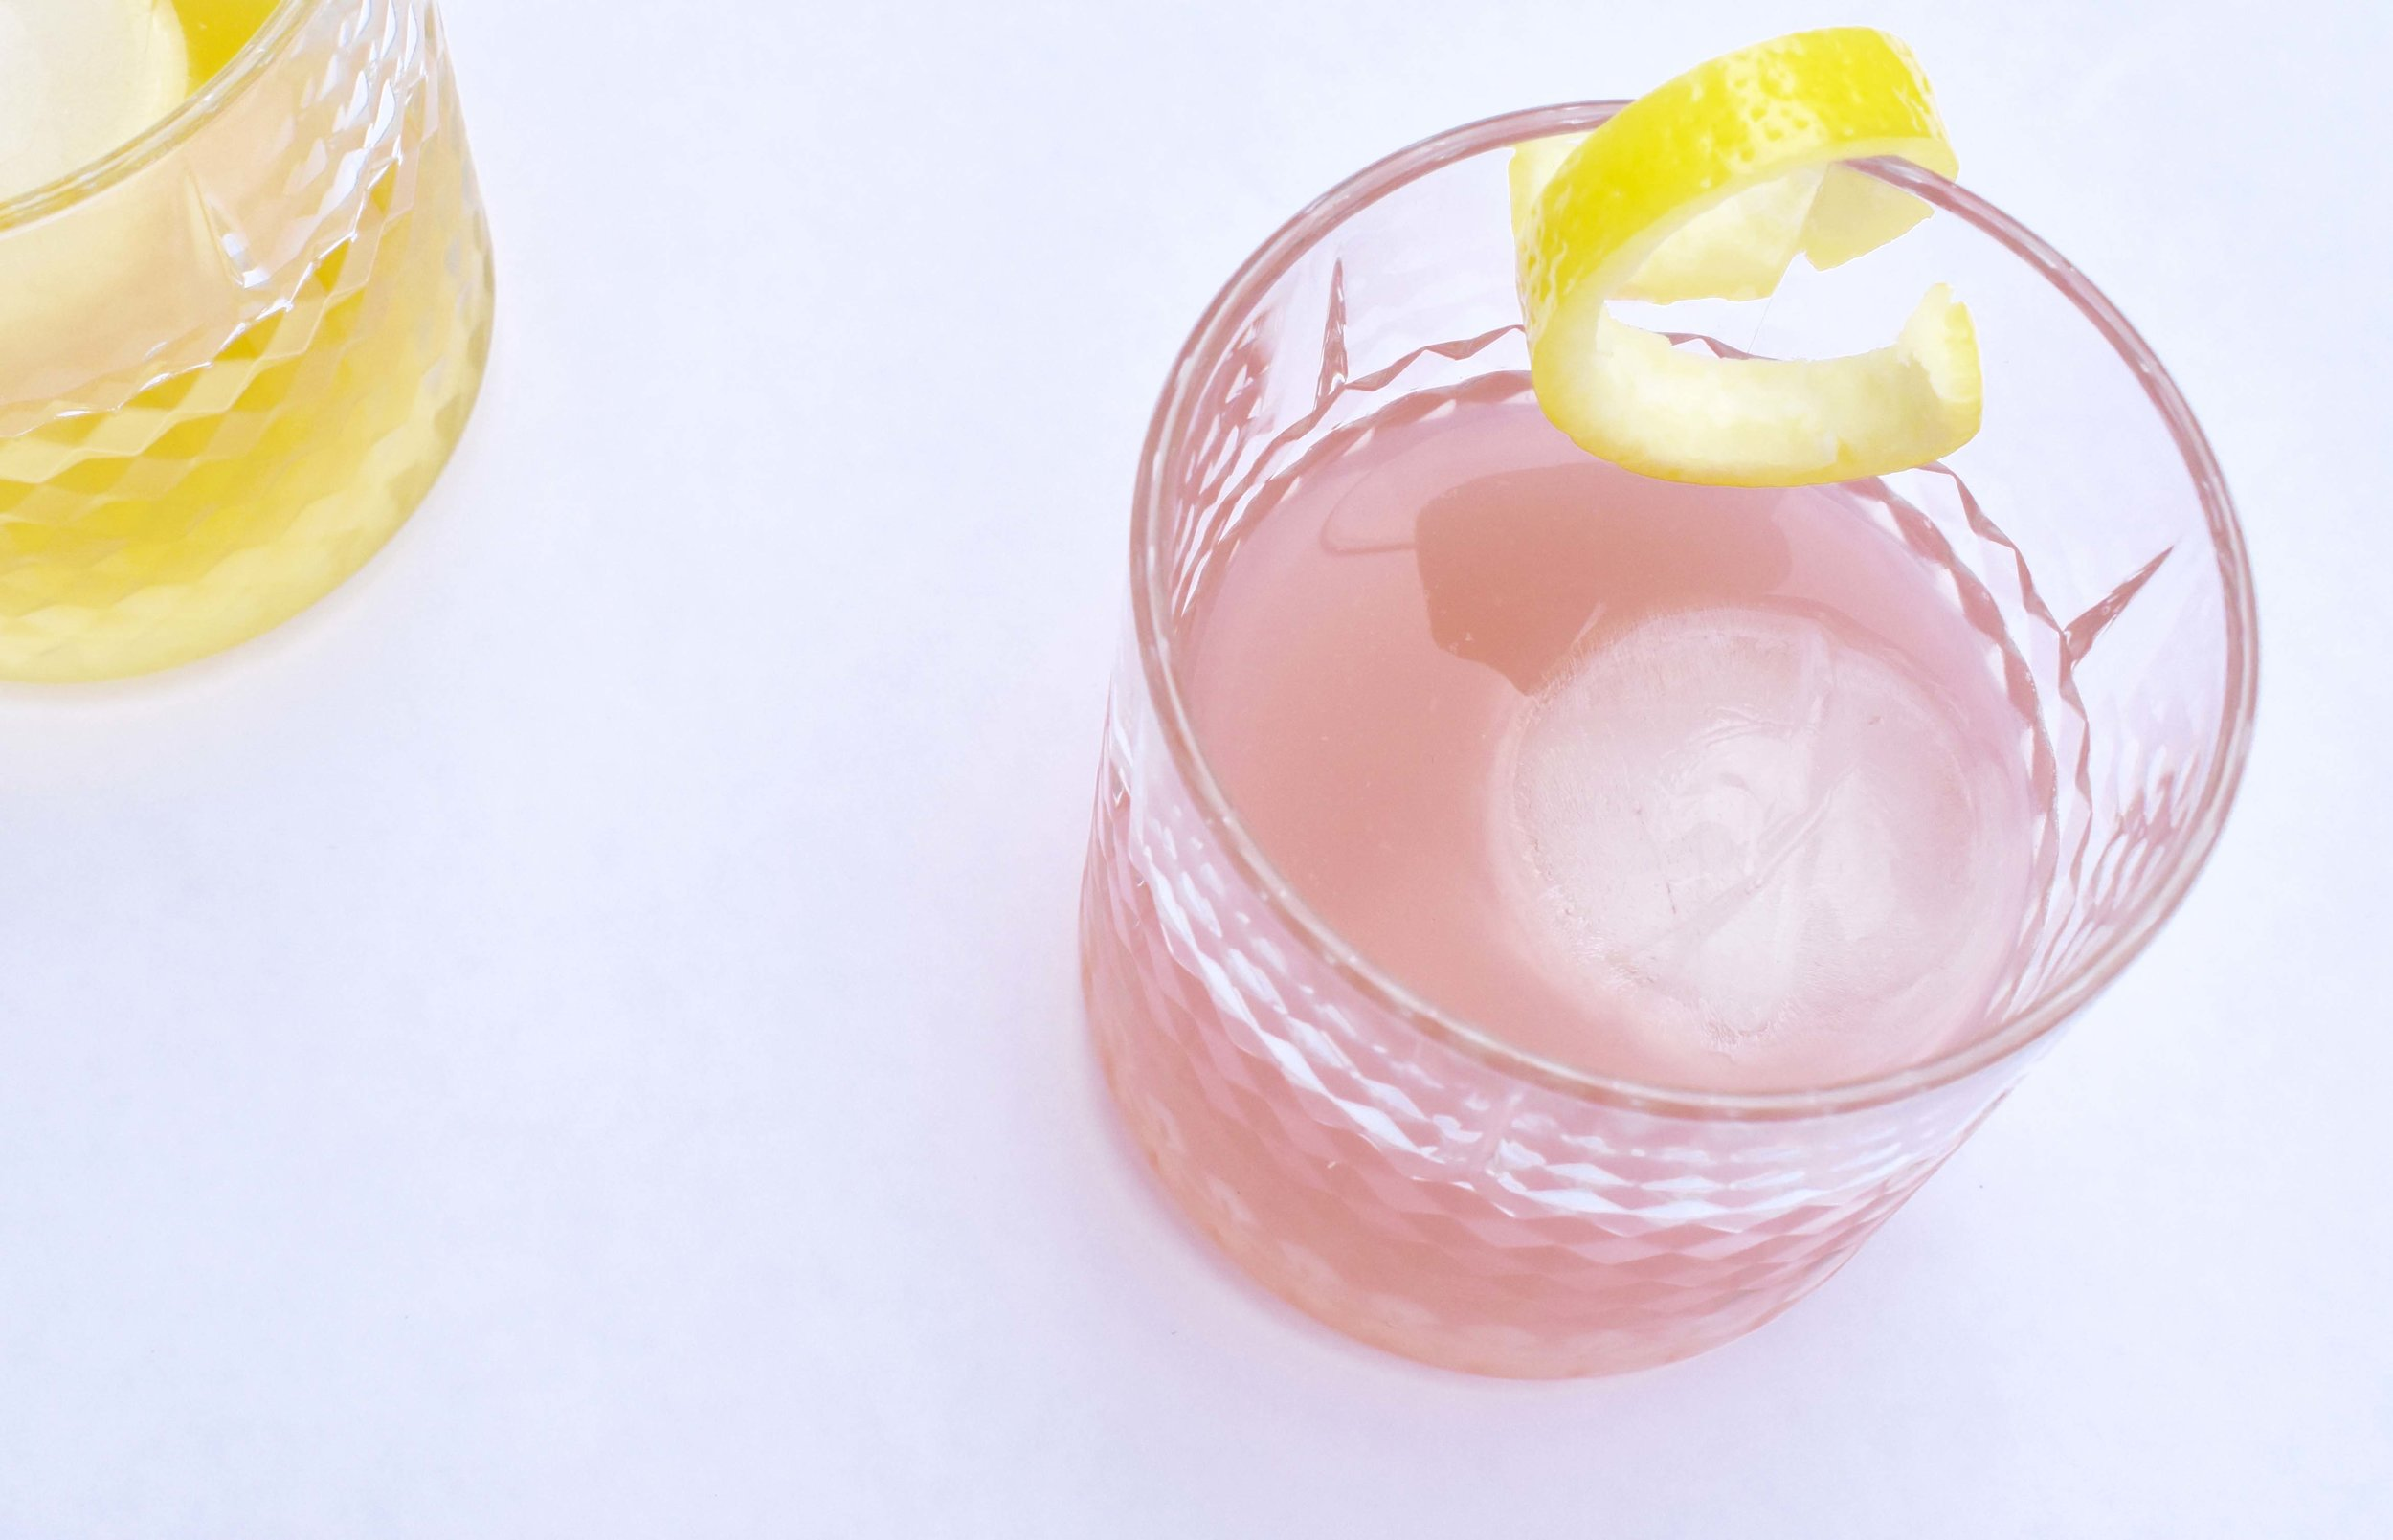 Garnish of Lemon Peel